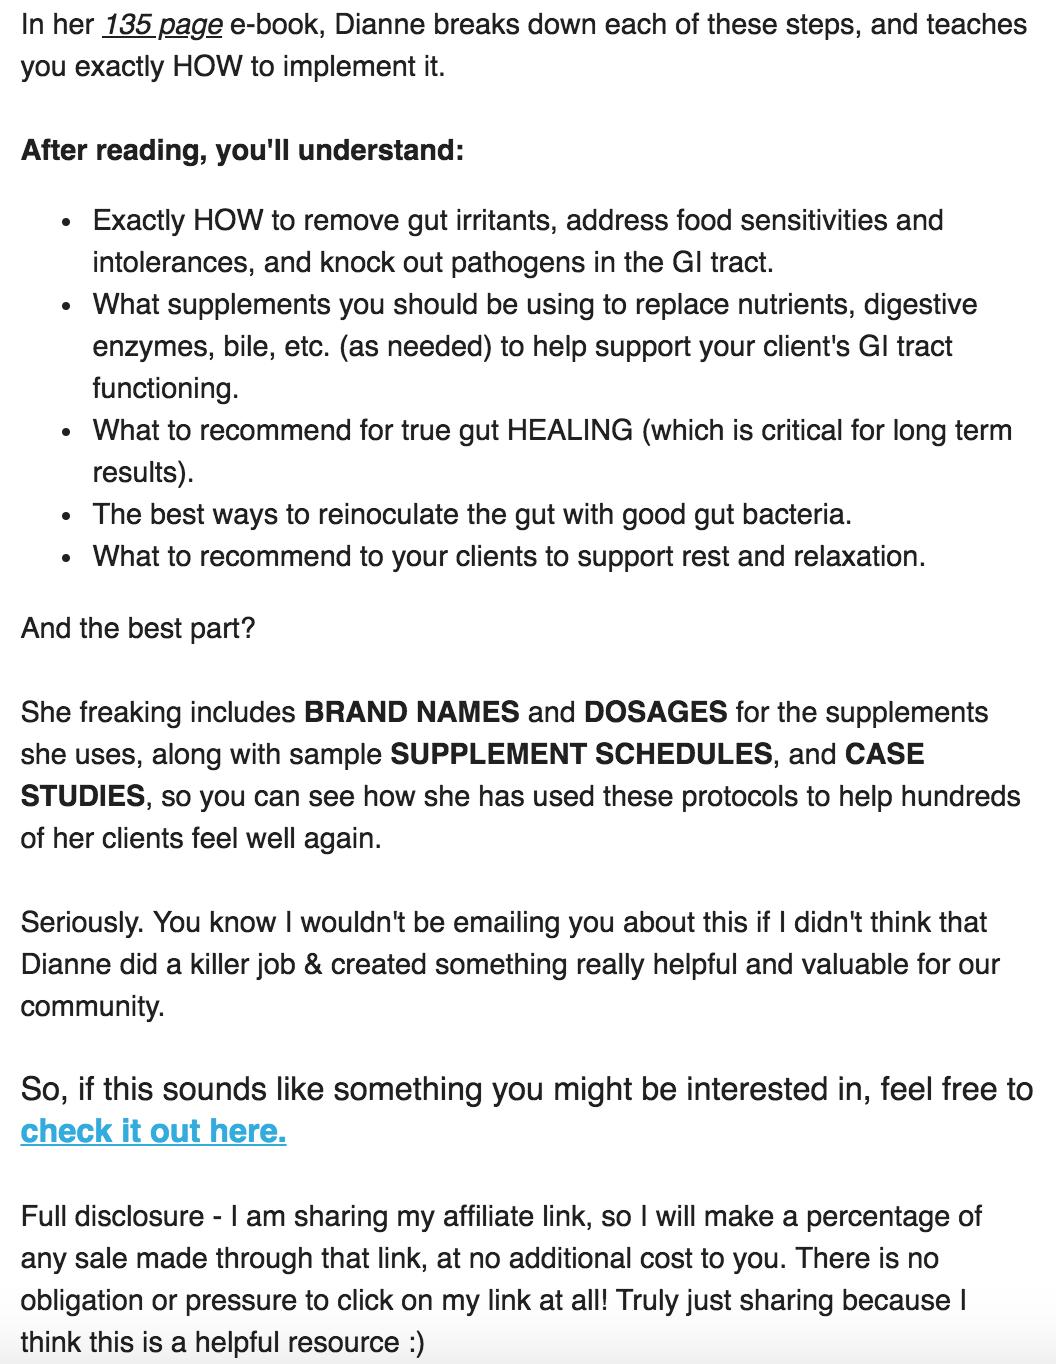 HTG Affiliate Email 2